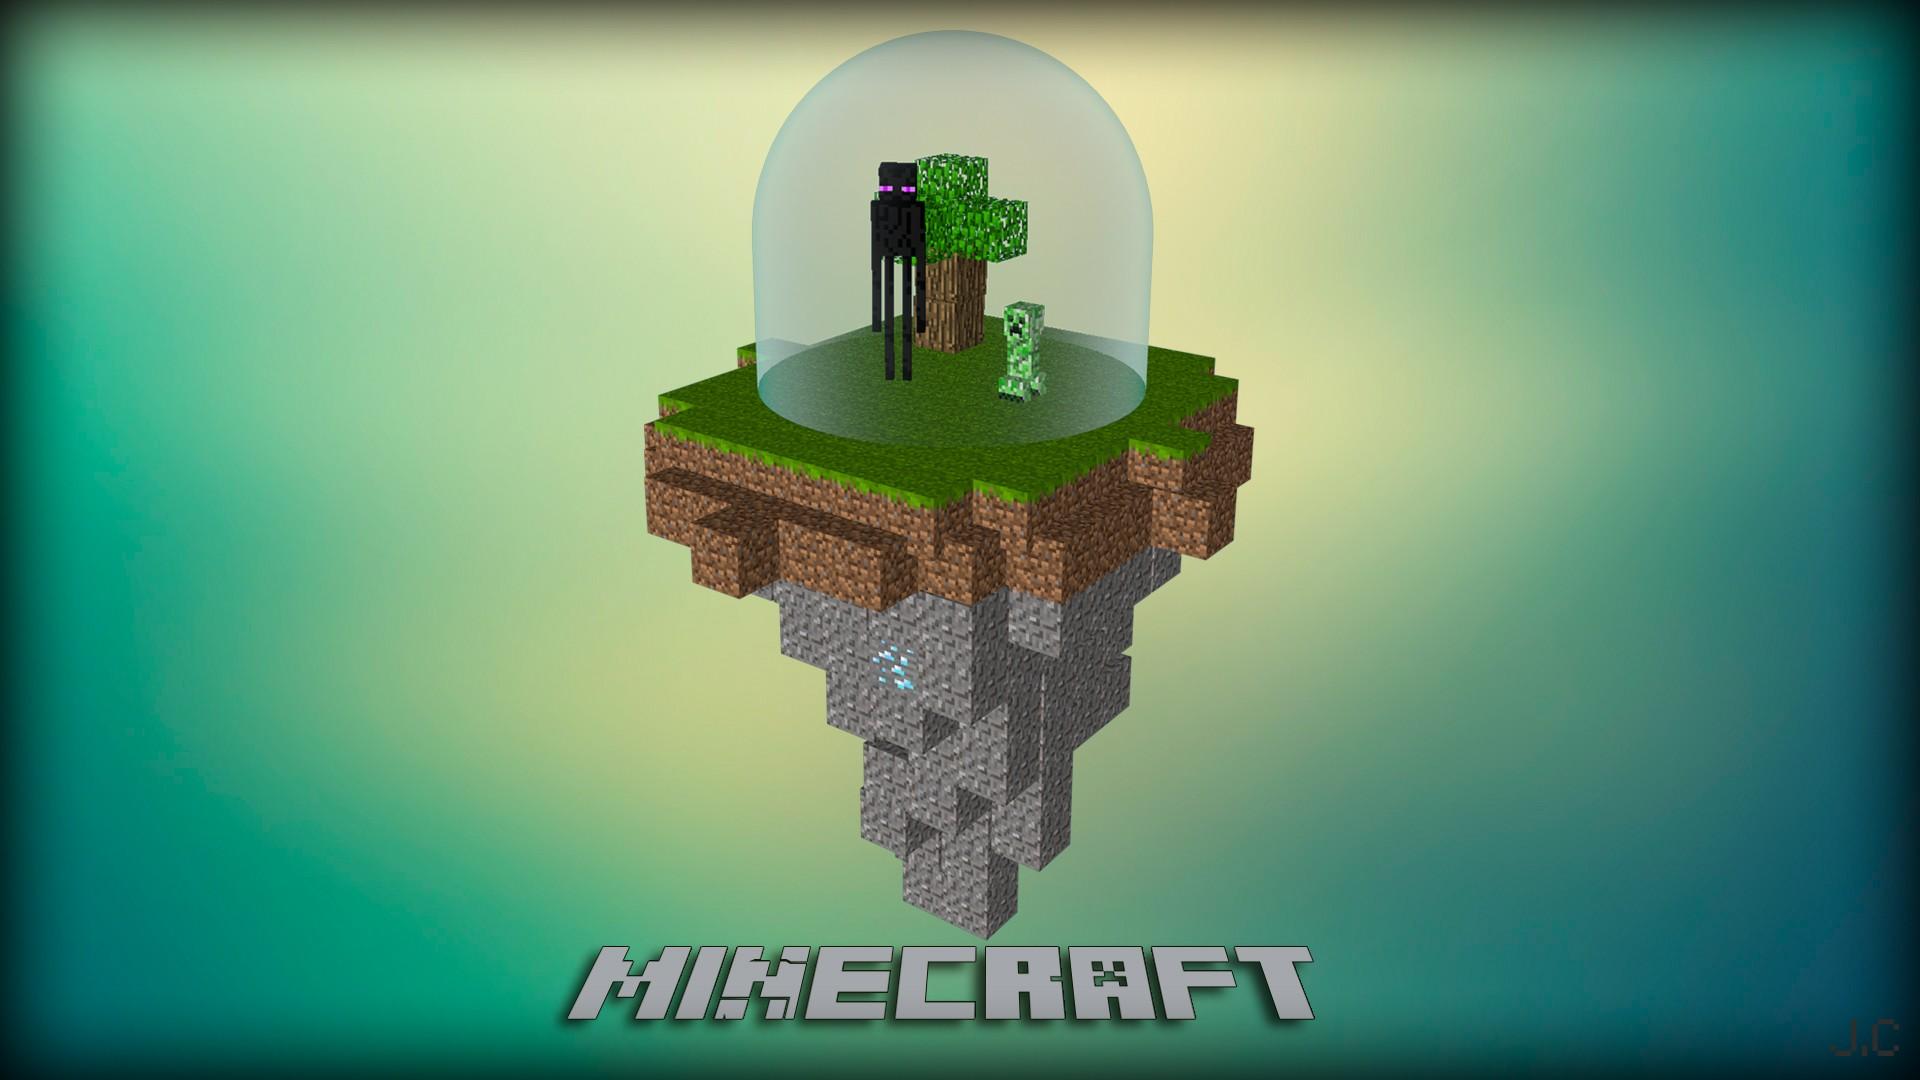 Video games Creeper Minecraft cinema 4d Enderman photomanipulation wallpaper | 1920x1080 | 63671 | WallpaperUP